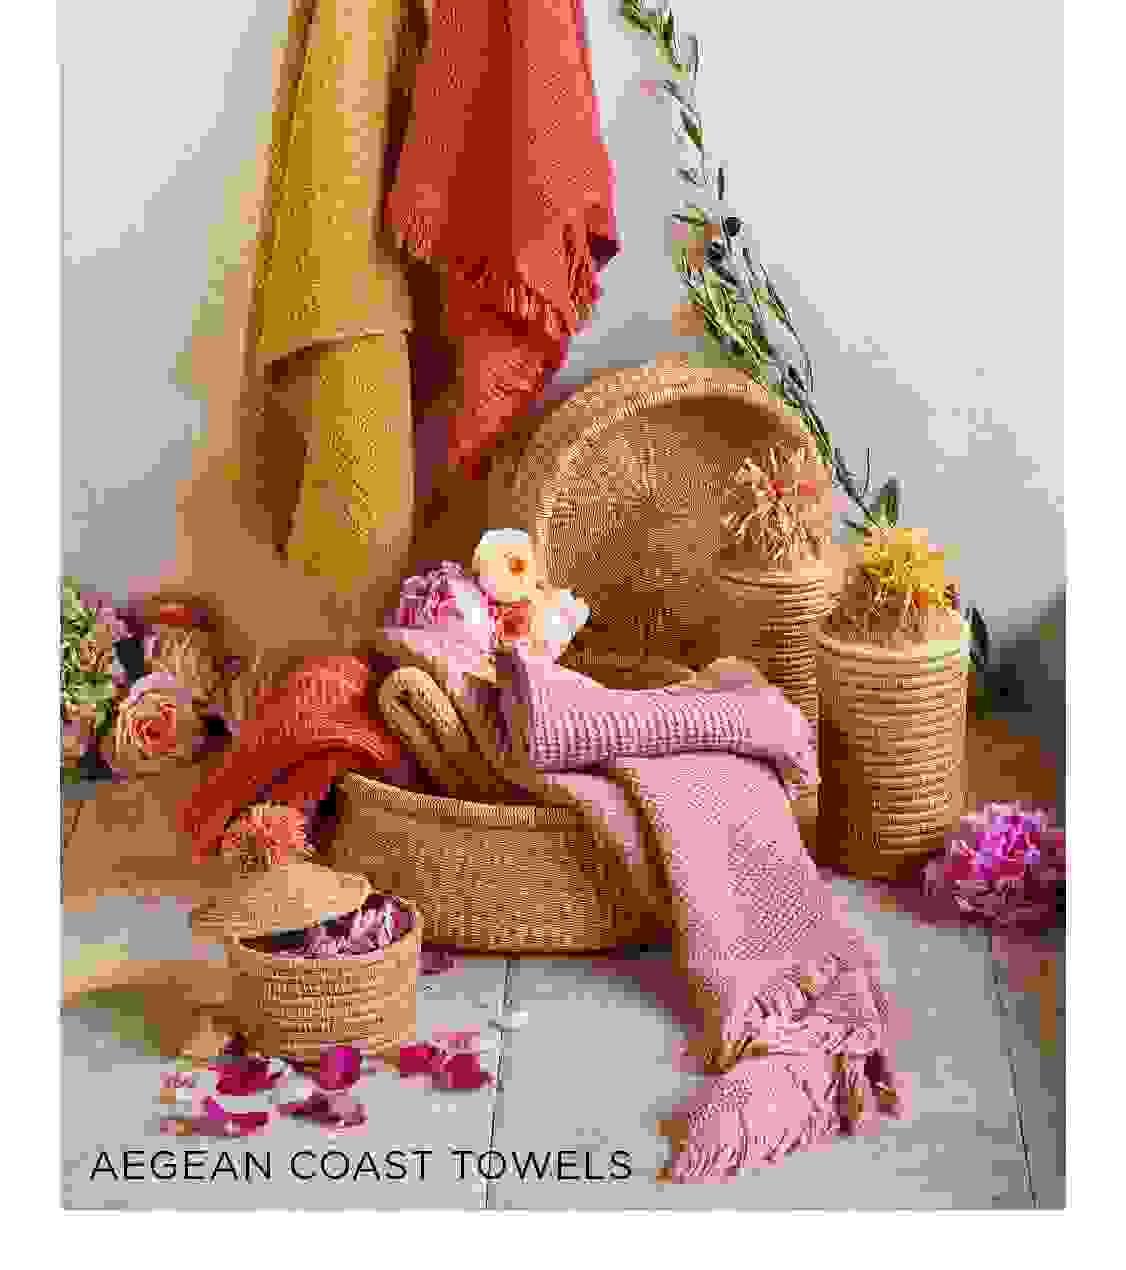 Aegean Coast Towels